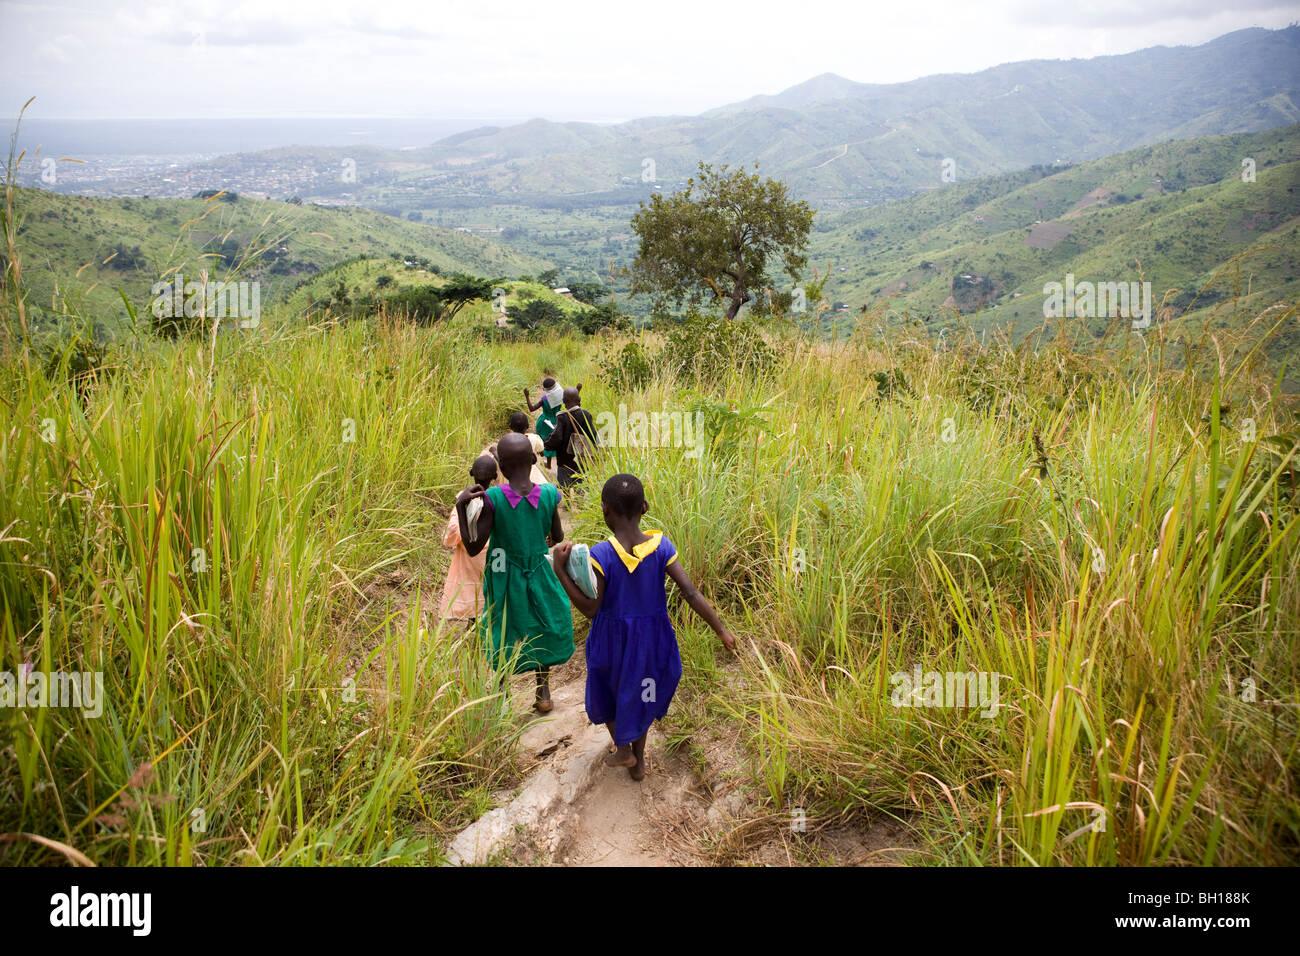 Children walking home after school in mountains in Uganda - Stock Image